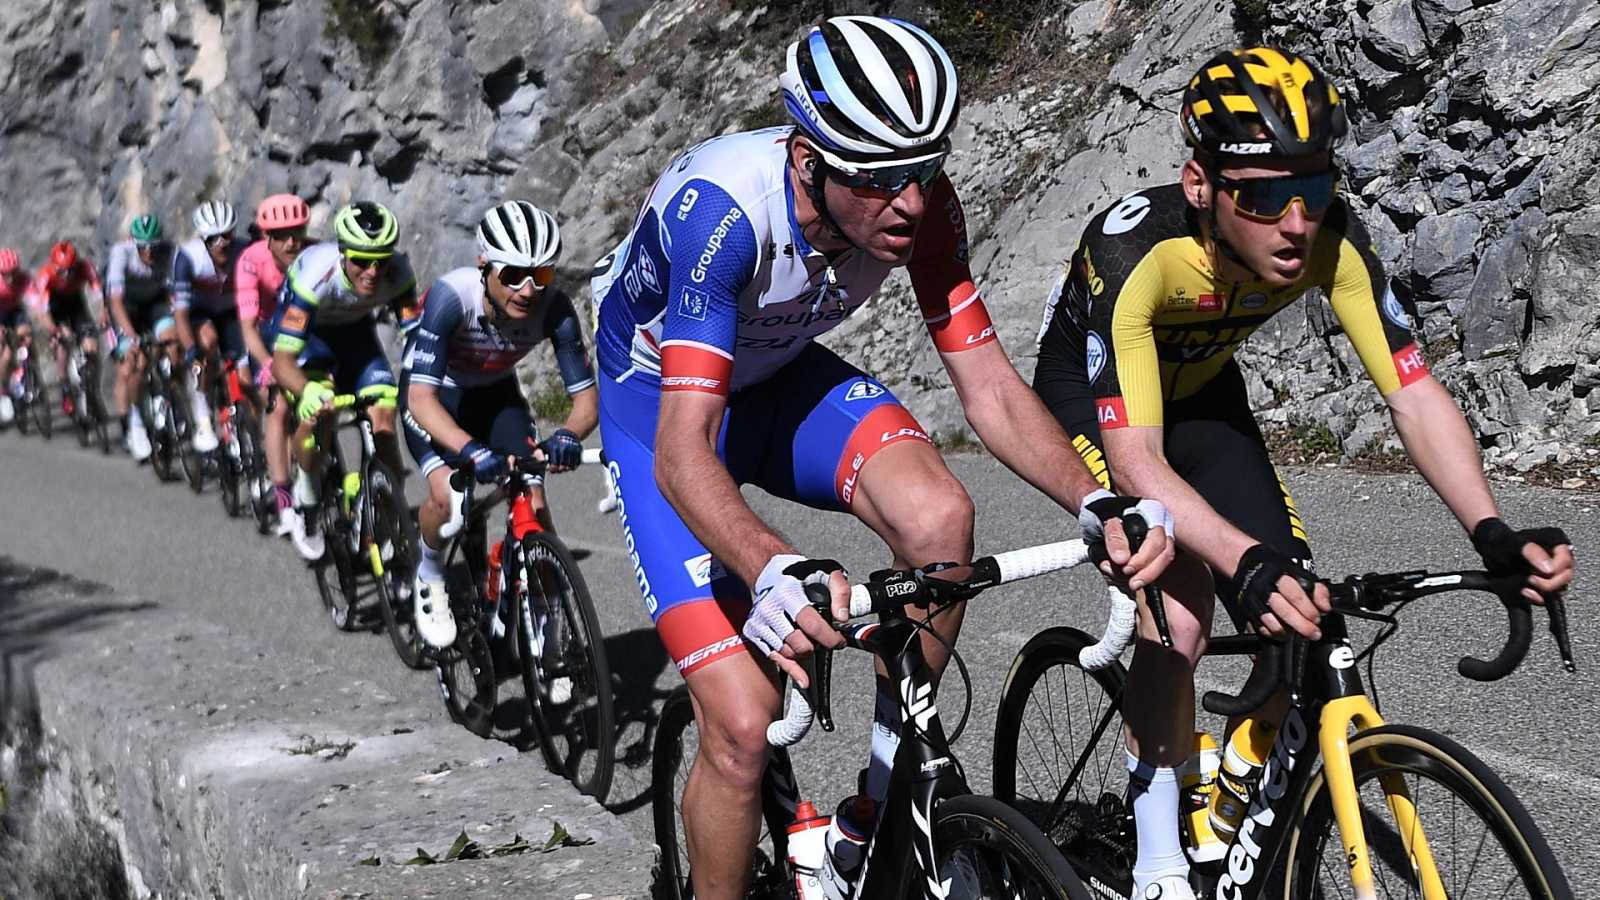 Ciclismo - París - Niza. 8ª etapa: Le Plan du Var - Levens - ver ahora